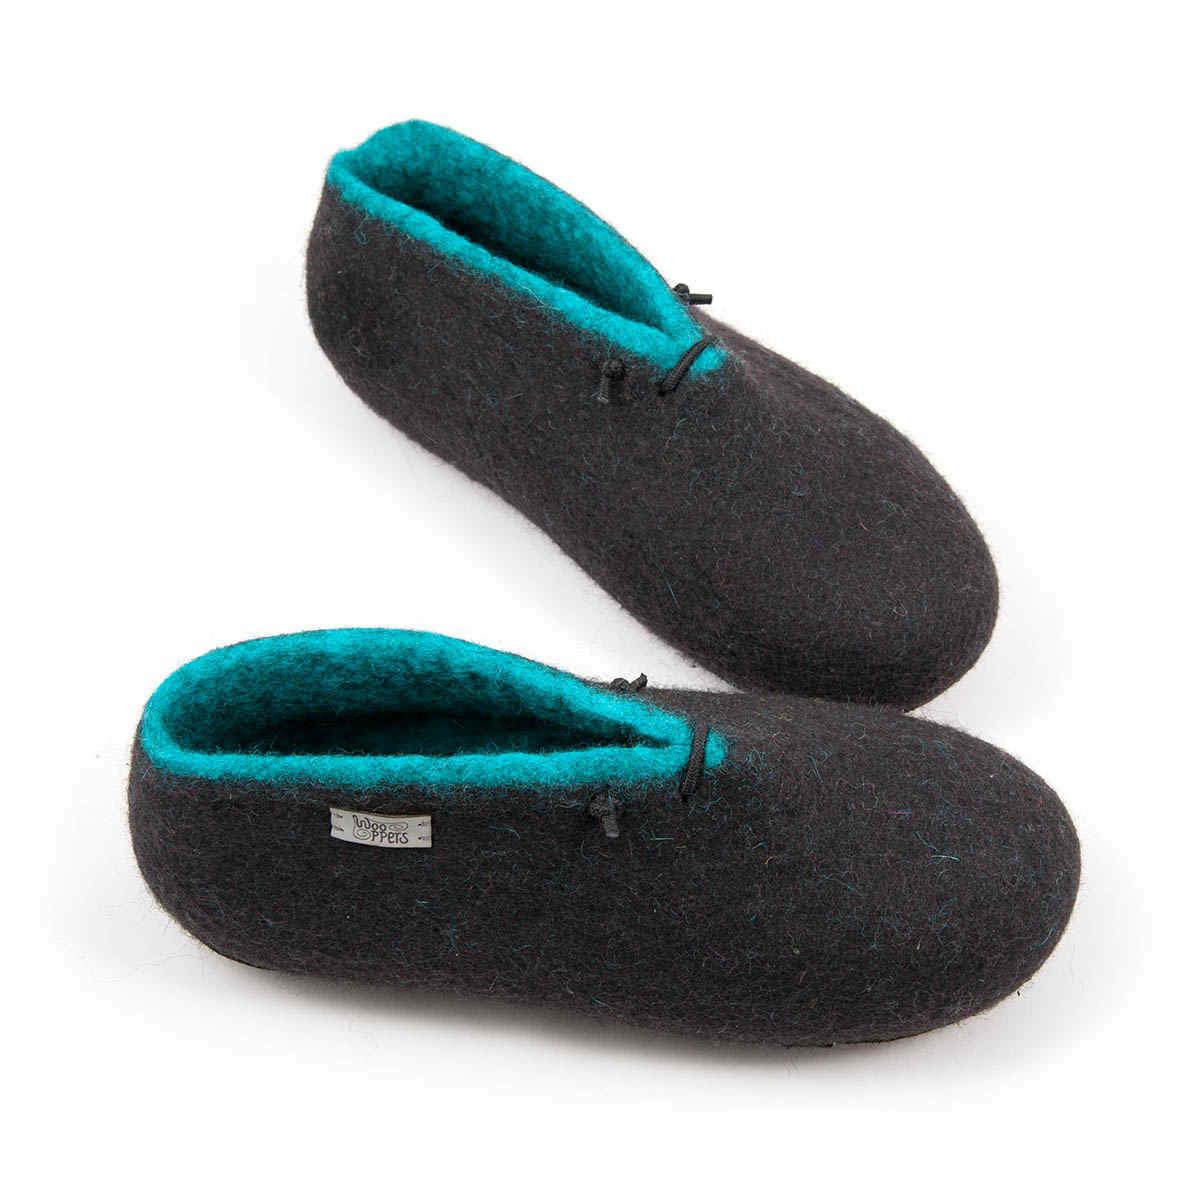 Black Slipper boots